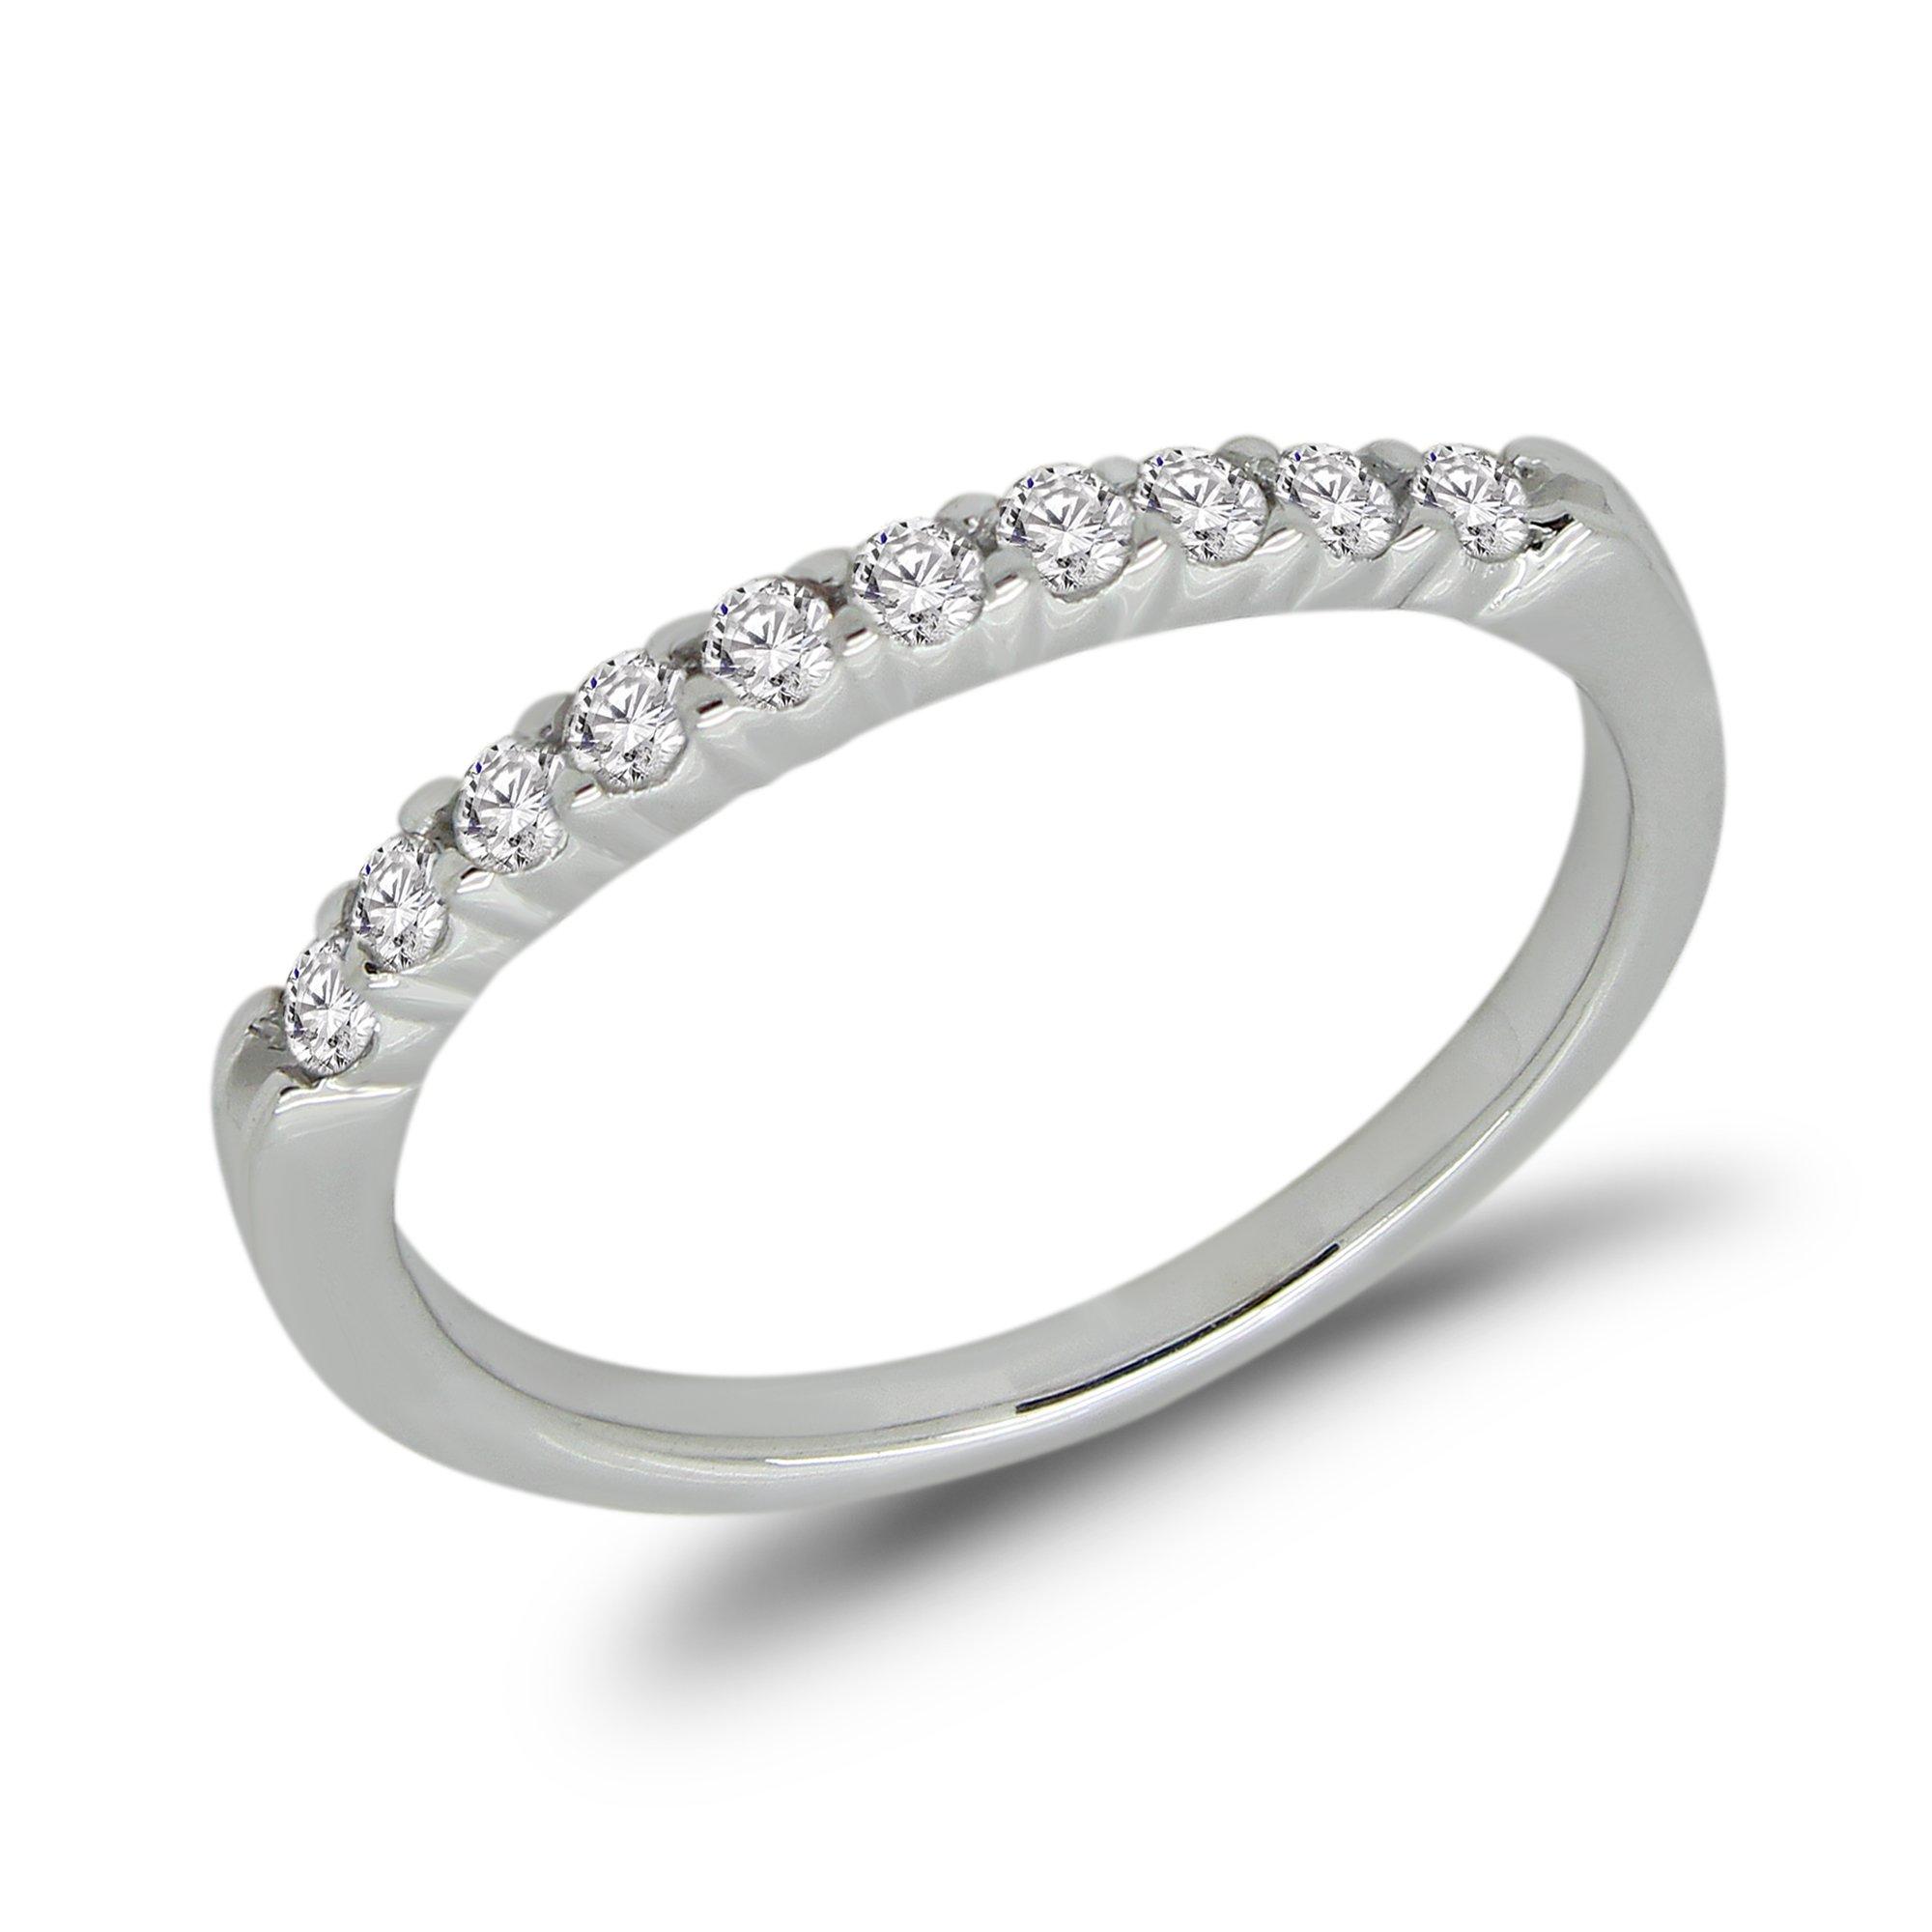 0.25 Ct Round Cut Natural Diamond 14K White Gold Wedding Band Ring Size - 7